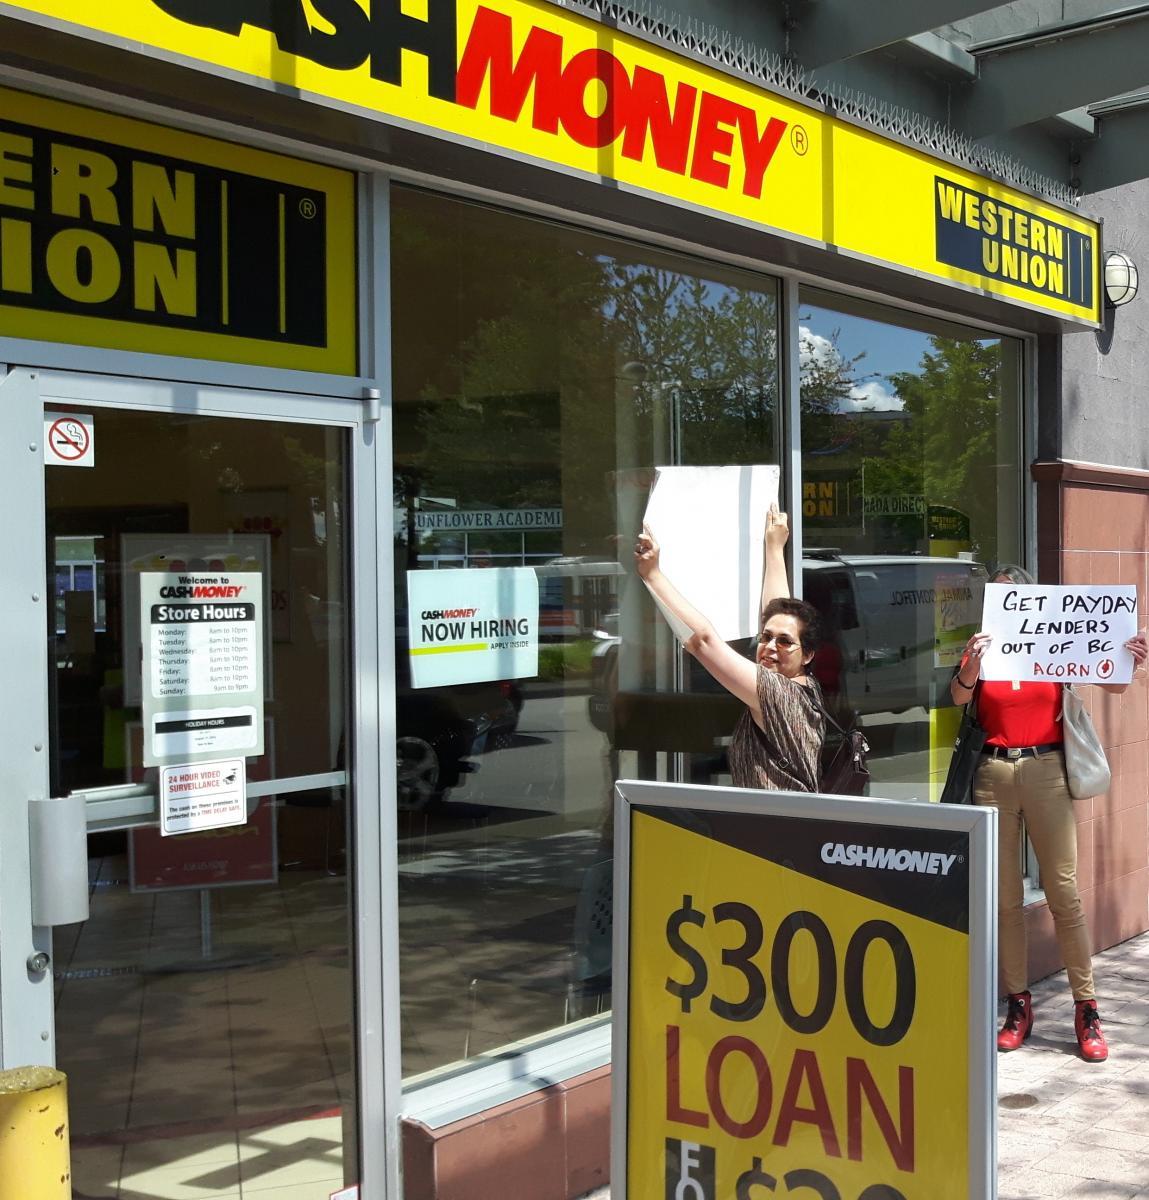 1000 payday loan 247 photo 9